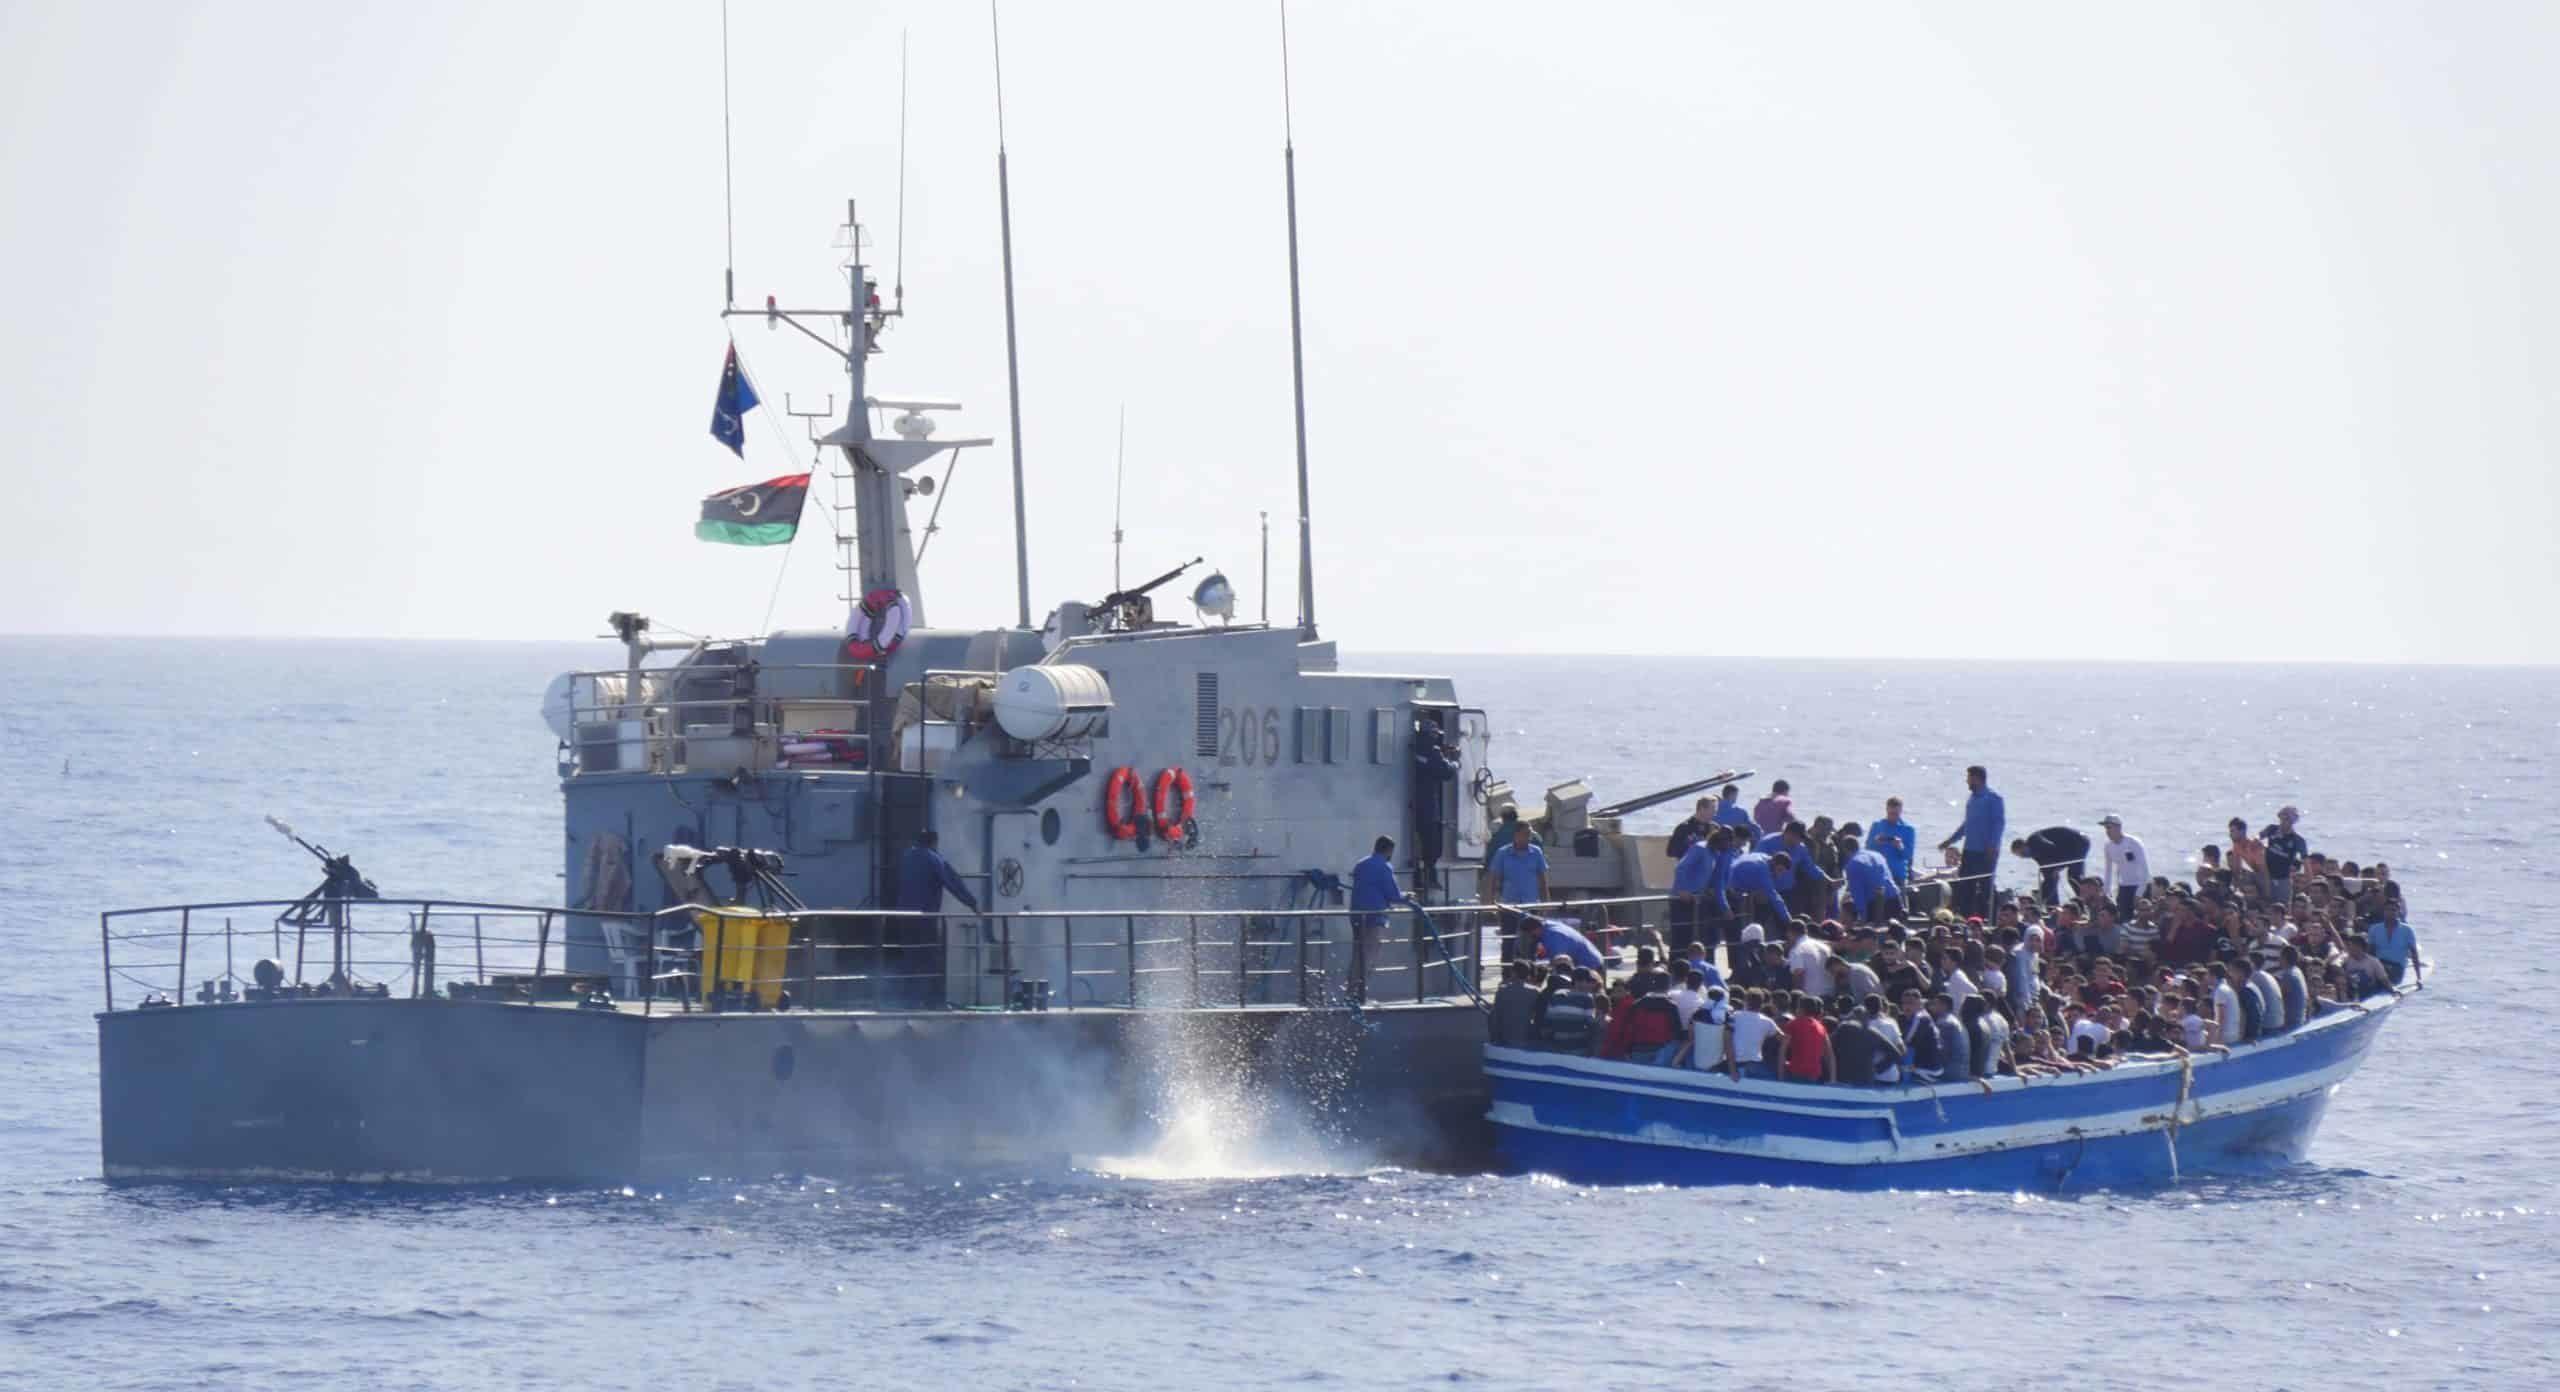 sea watch - photo #11